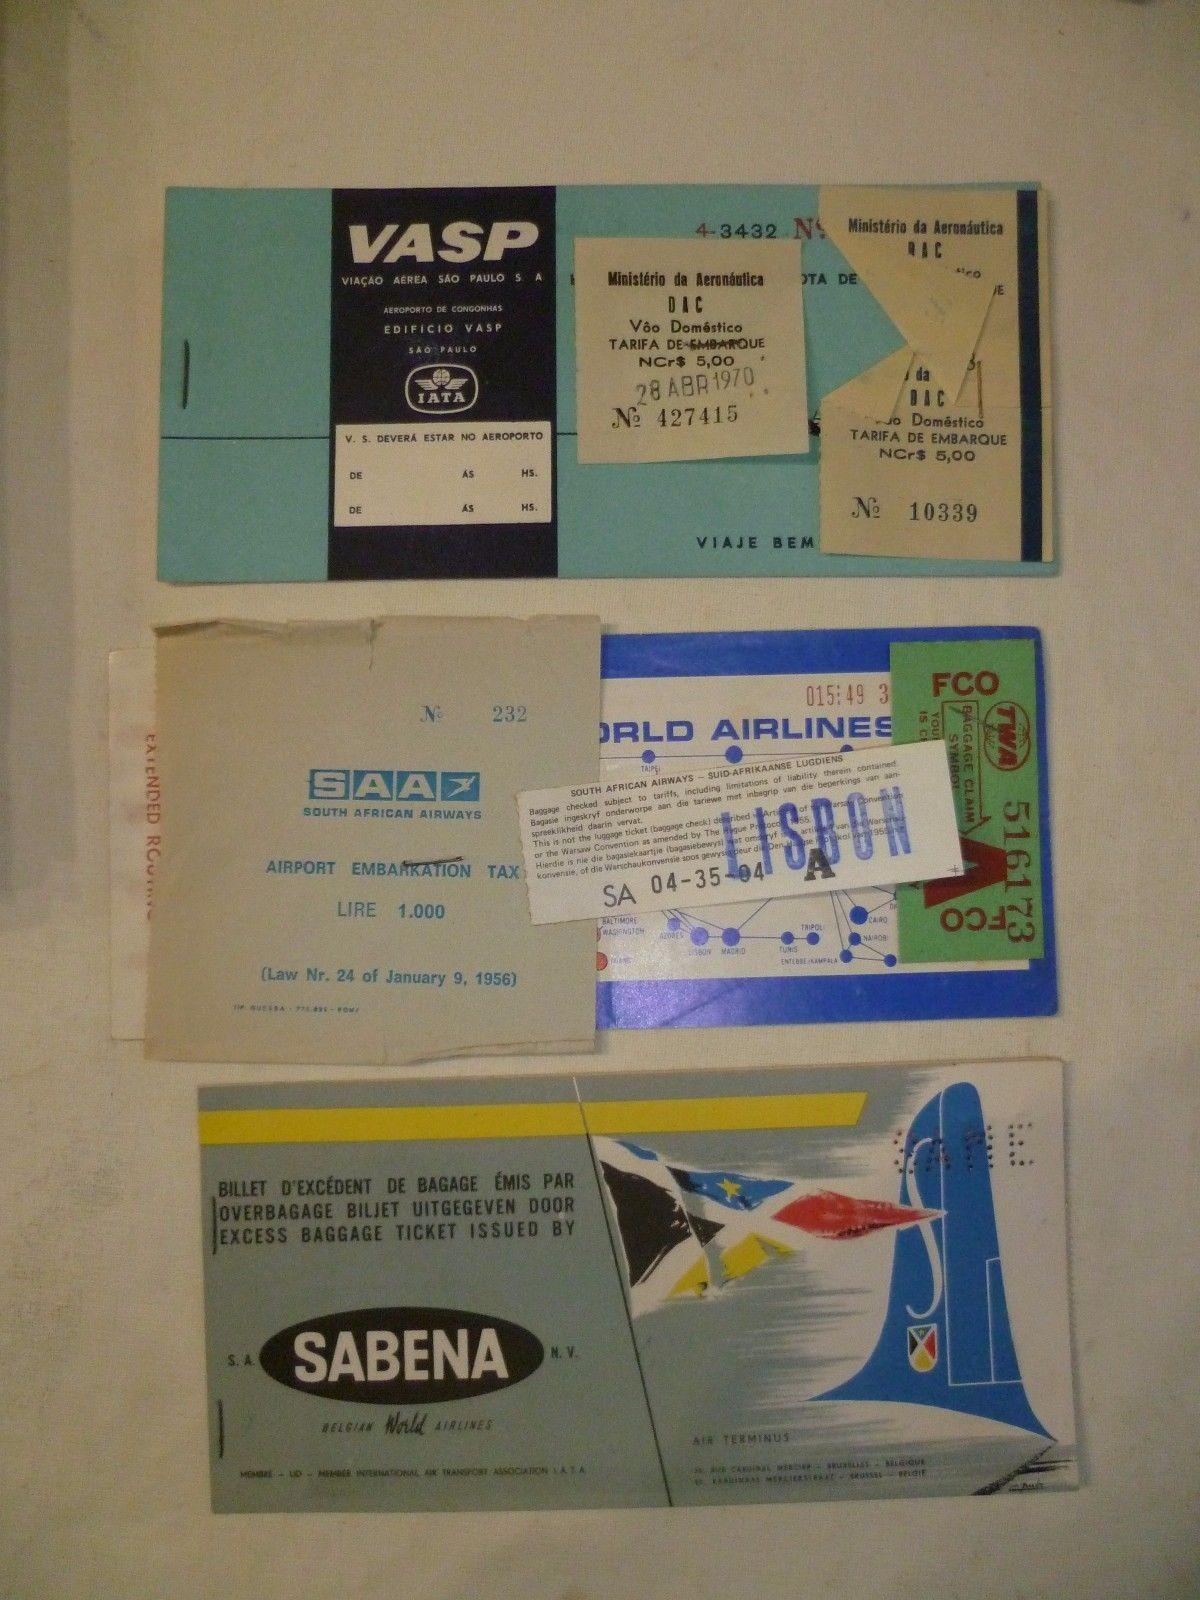 Old Airline Tickets Vasp SAA Sabena Old | eBay | Vintage Airline ...